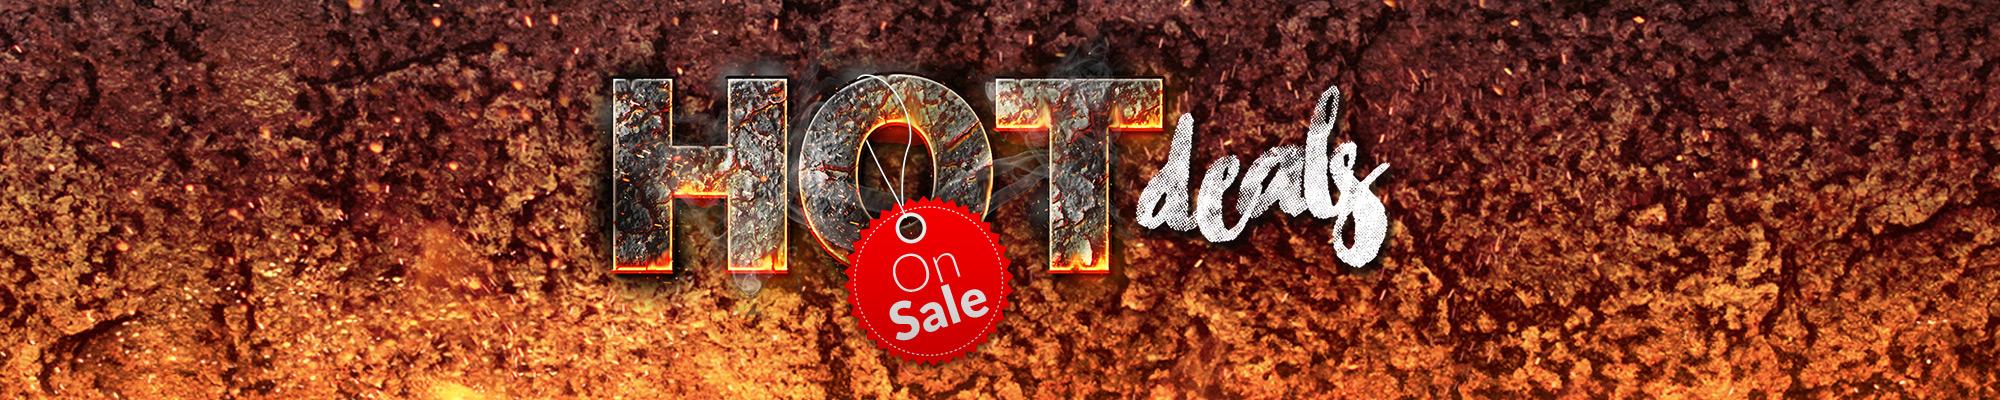 Hot Deals - On Sale